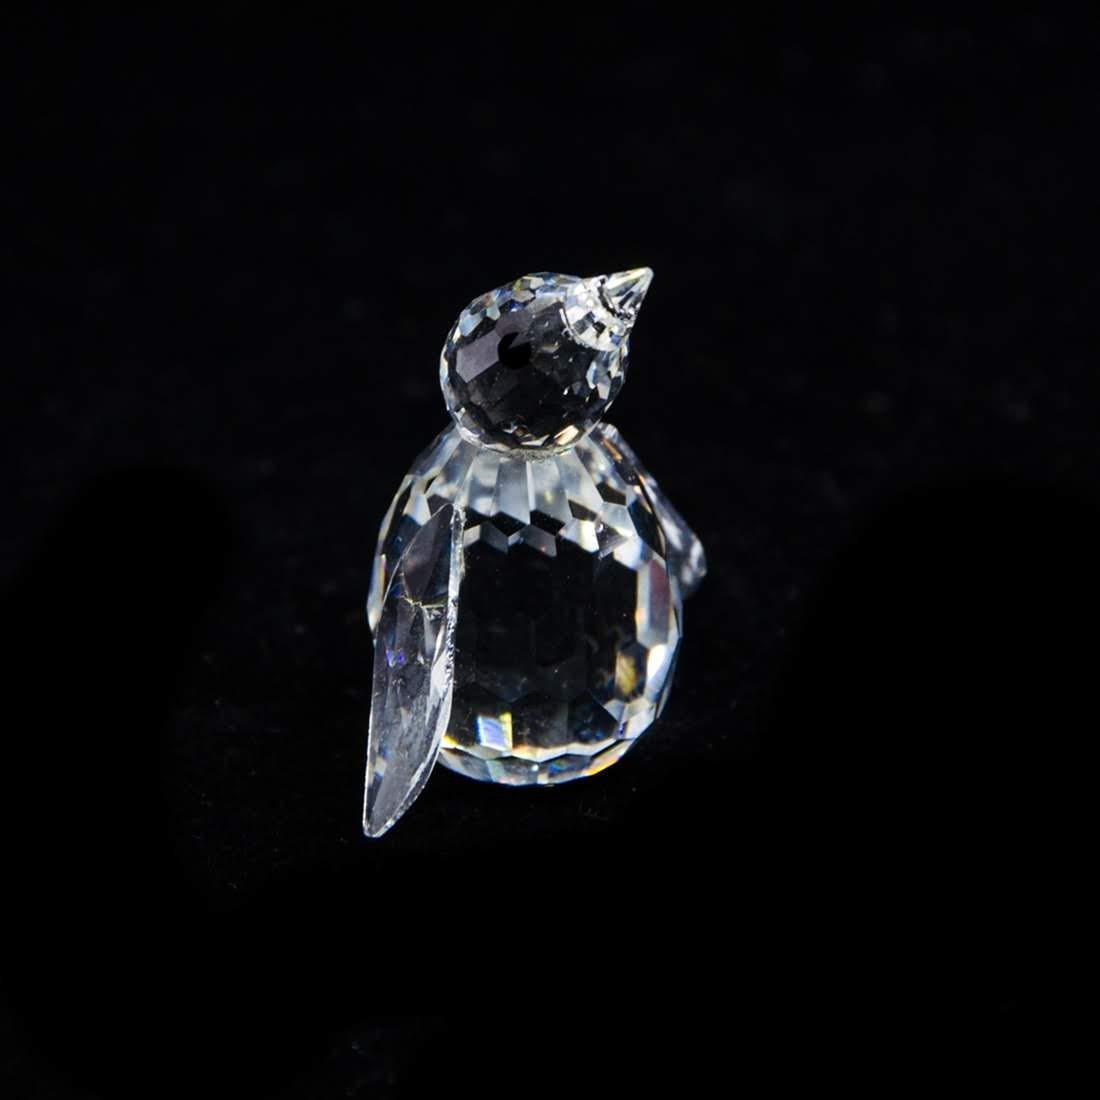 Swarovski Silver Crystal Penguin Figurine - 7661